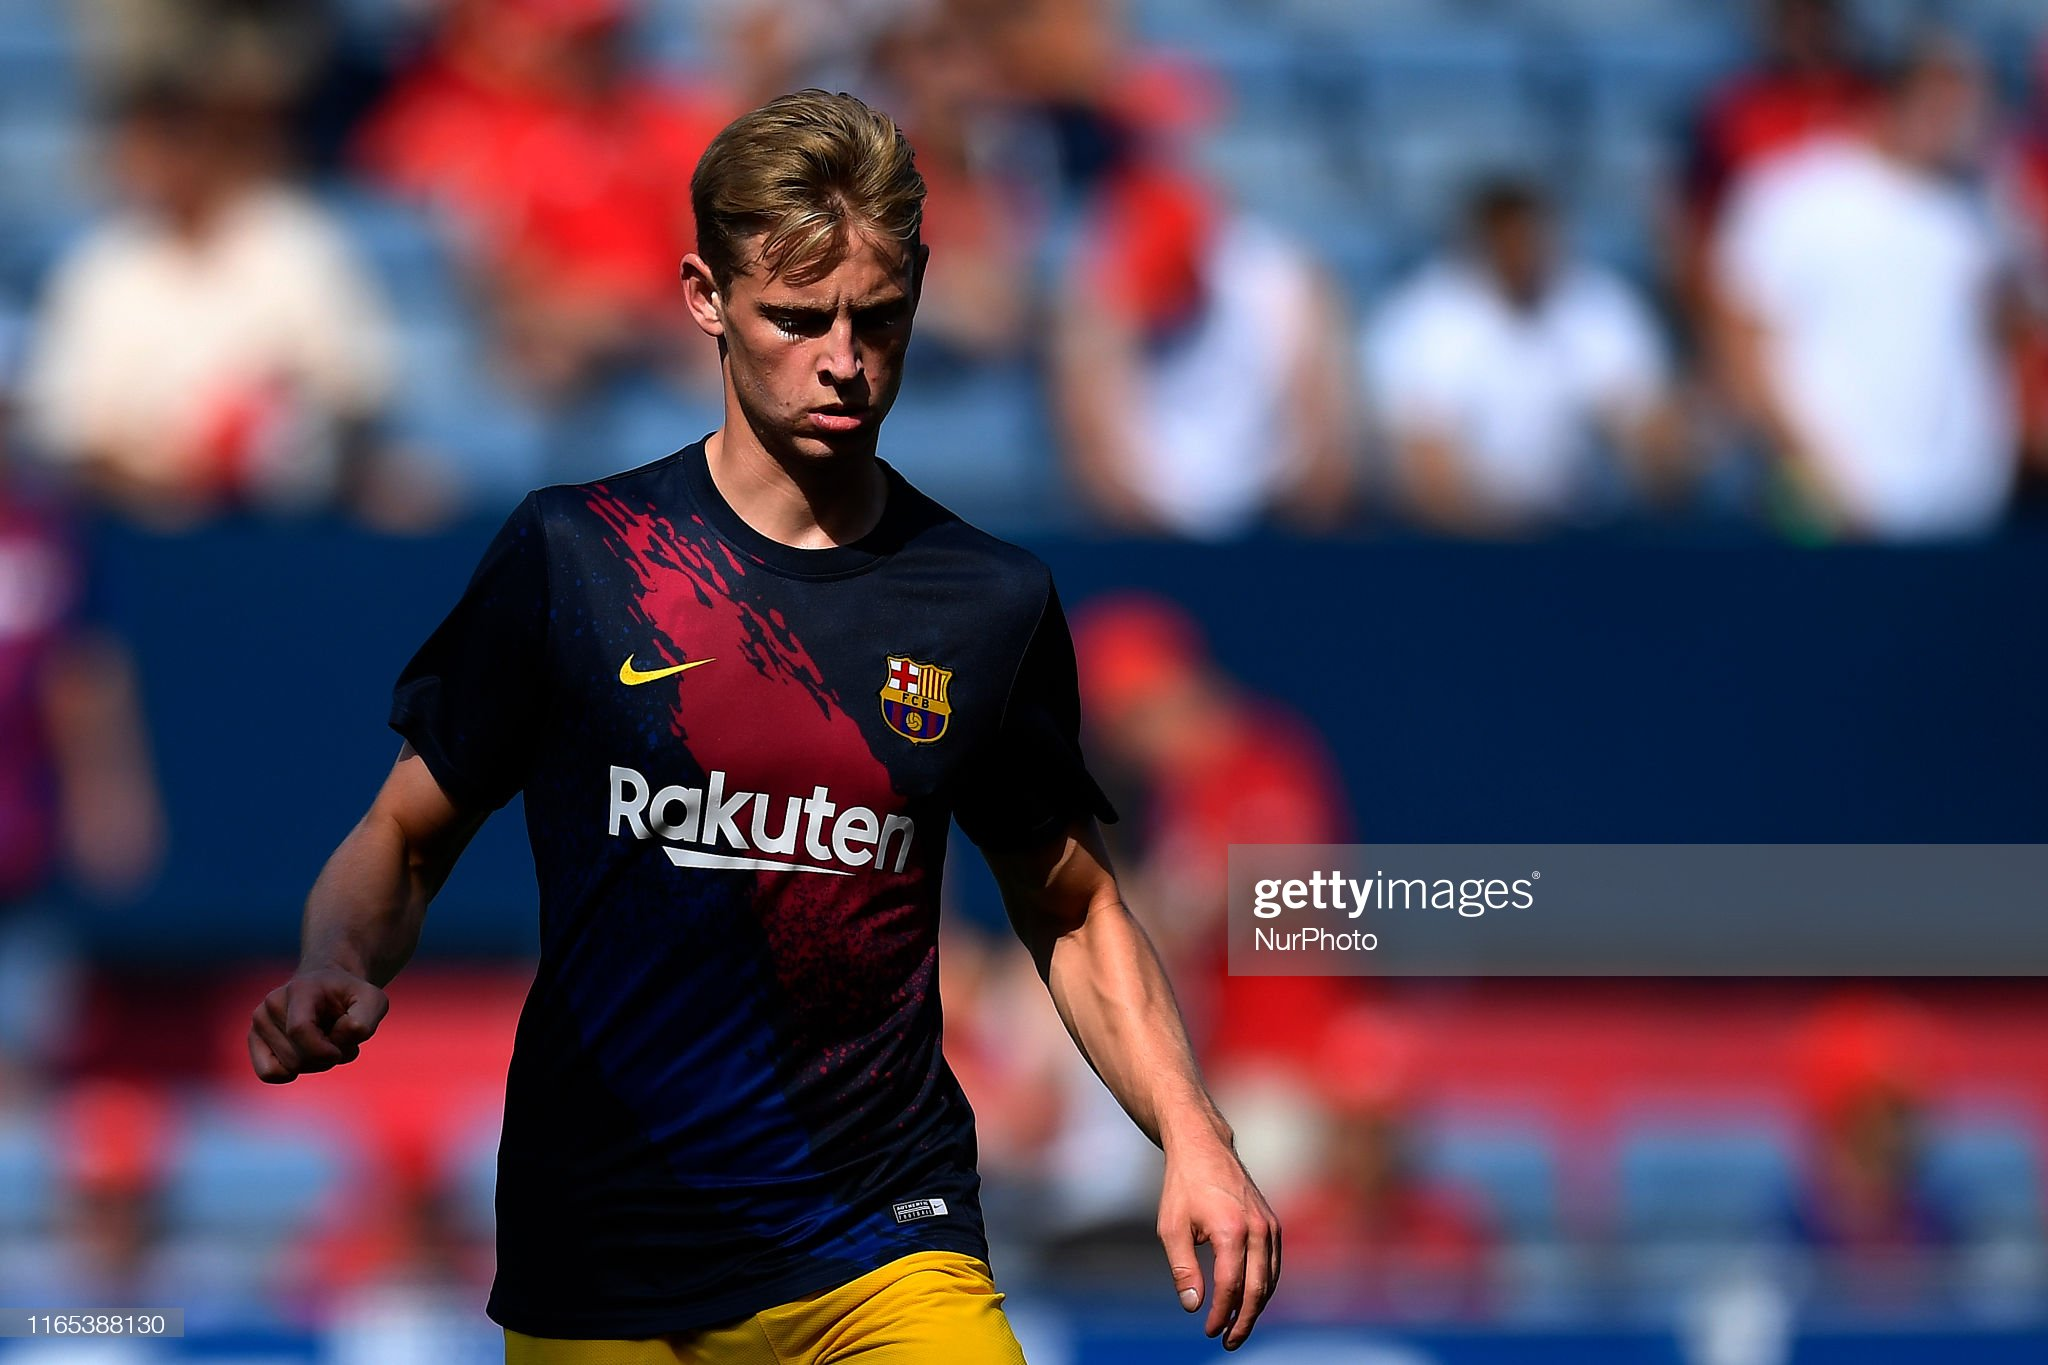 صور مباراة : أوساسونا - برشلونة 2-2 ( 31-08-2019 )  Frenkie-de-jong-of-barcelona-during-the-warmup-before-the-liga-match-picture-id1165388130?s=2048x2048